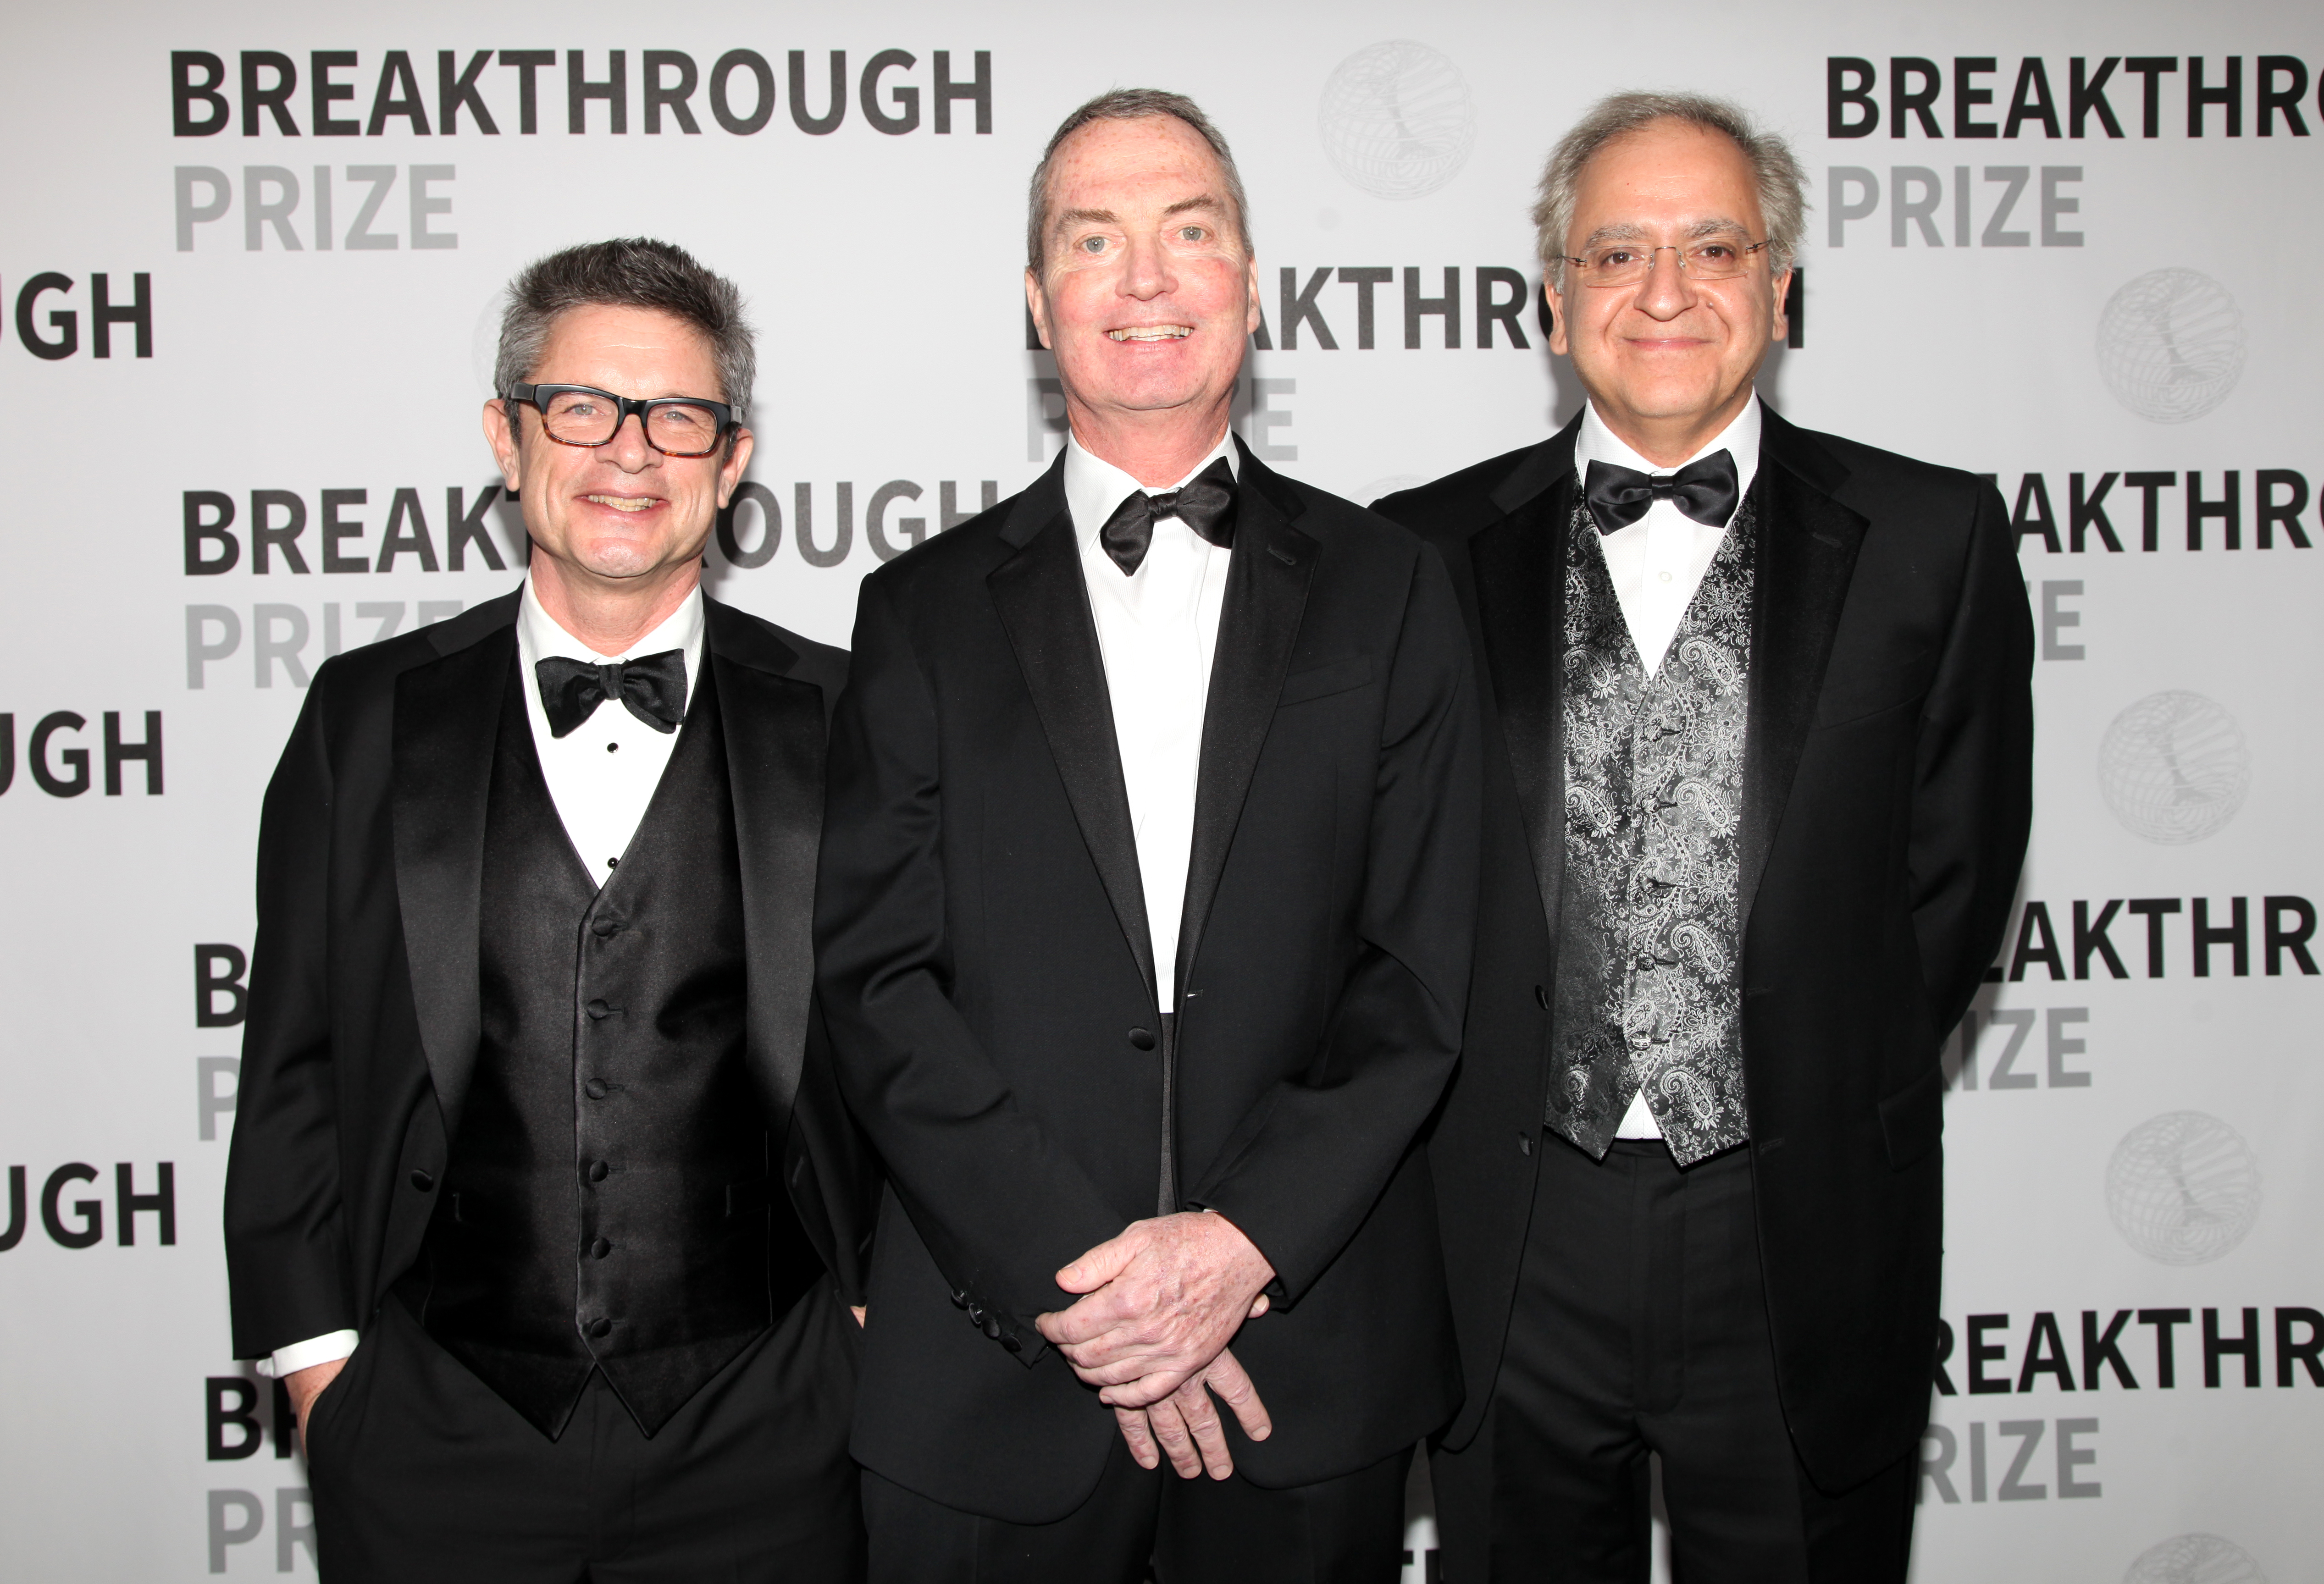 Physicists Andrew Strominger, Cumrun Vafa and Joseph Polchinski.